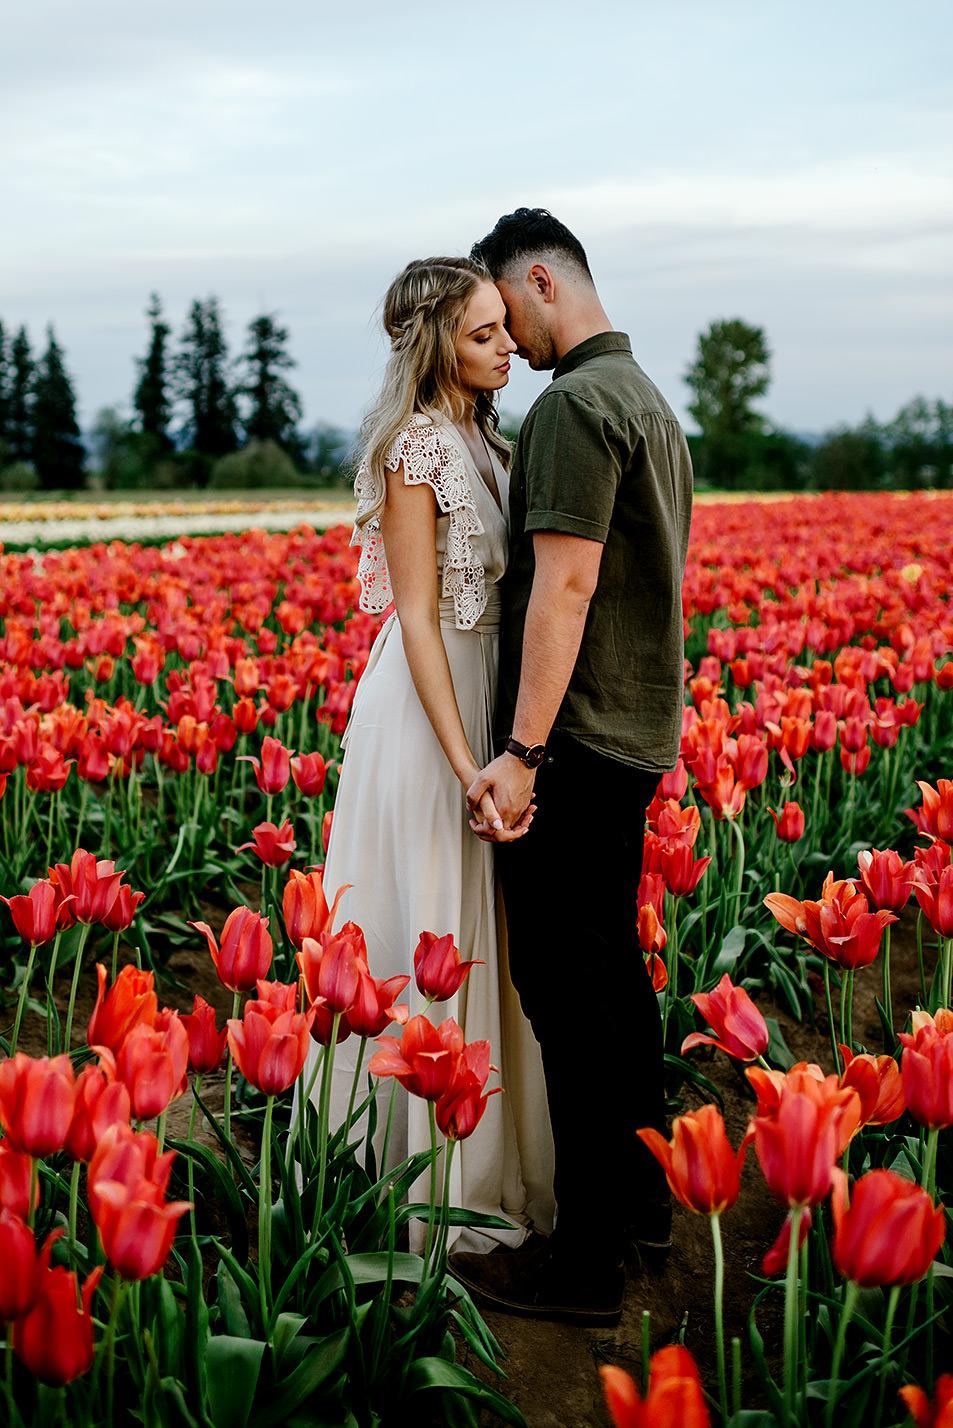 Tulip-field-engagement-session-Portland-Photographer-42.jpg